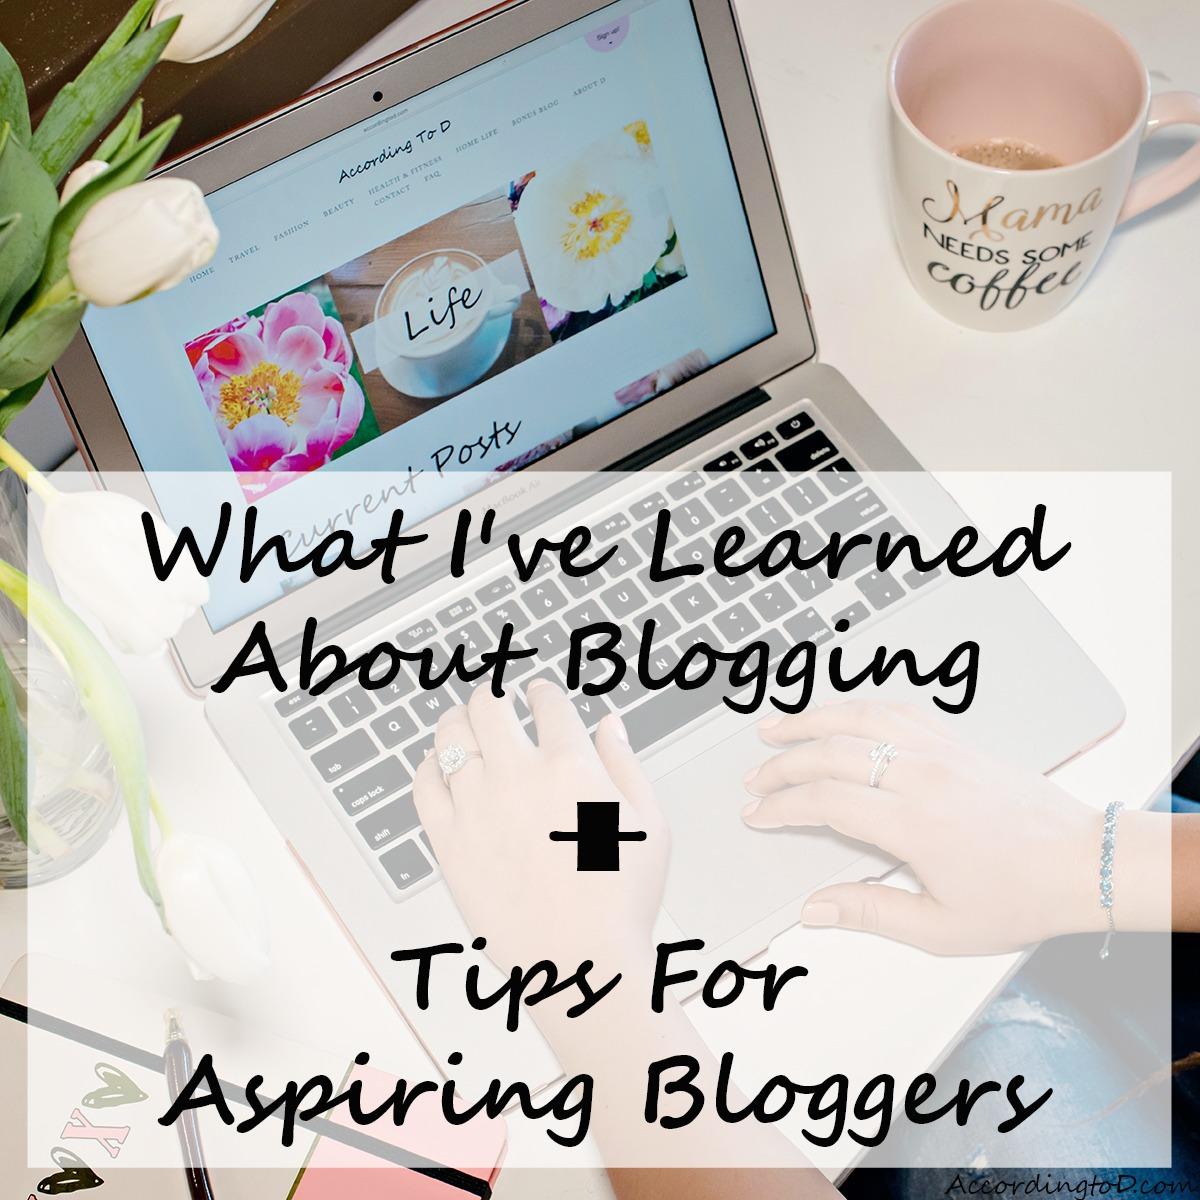 Tips for aspiring bloggers